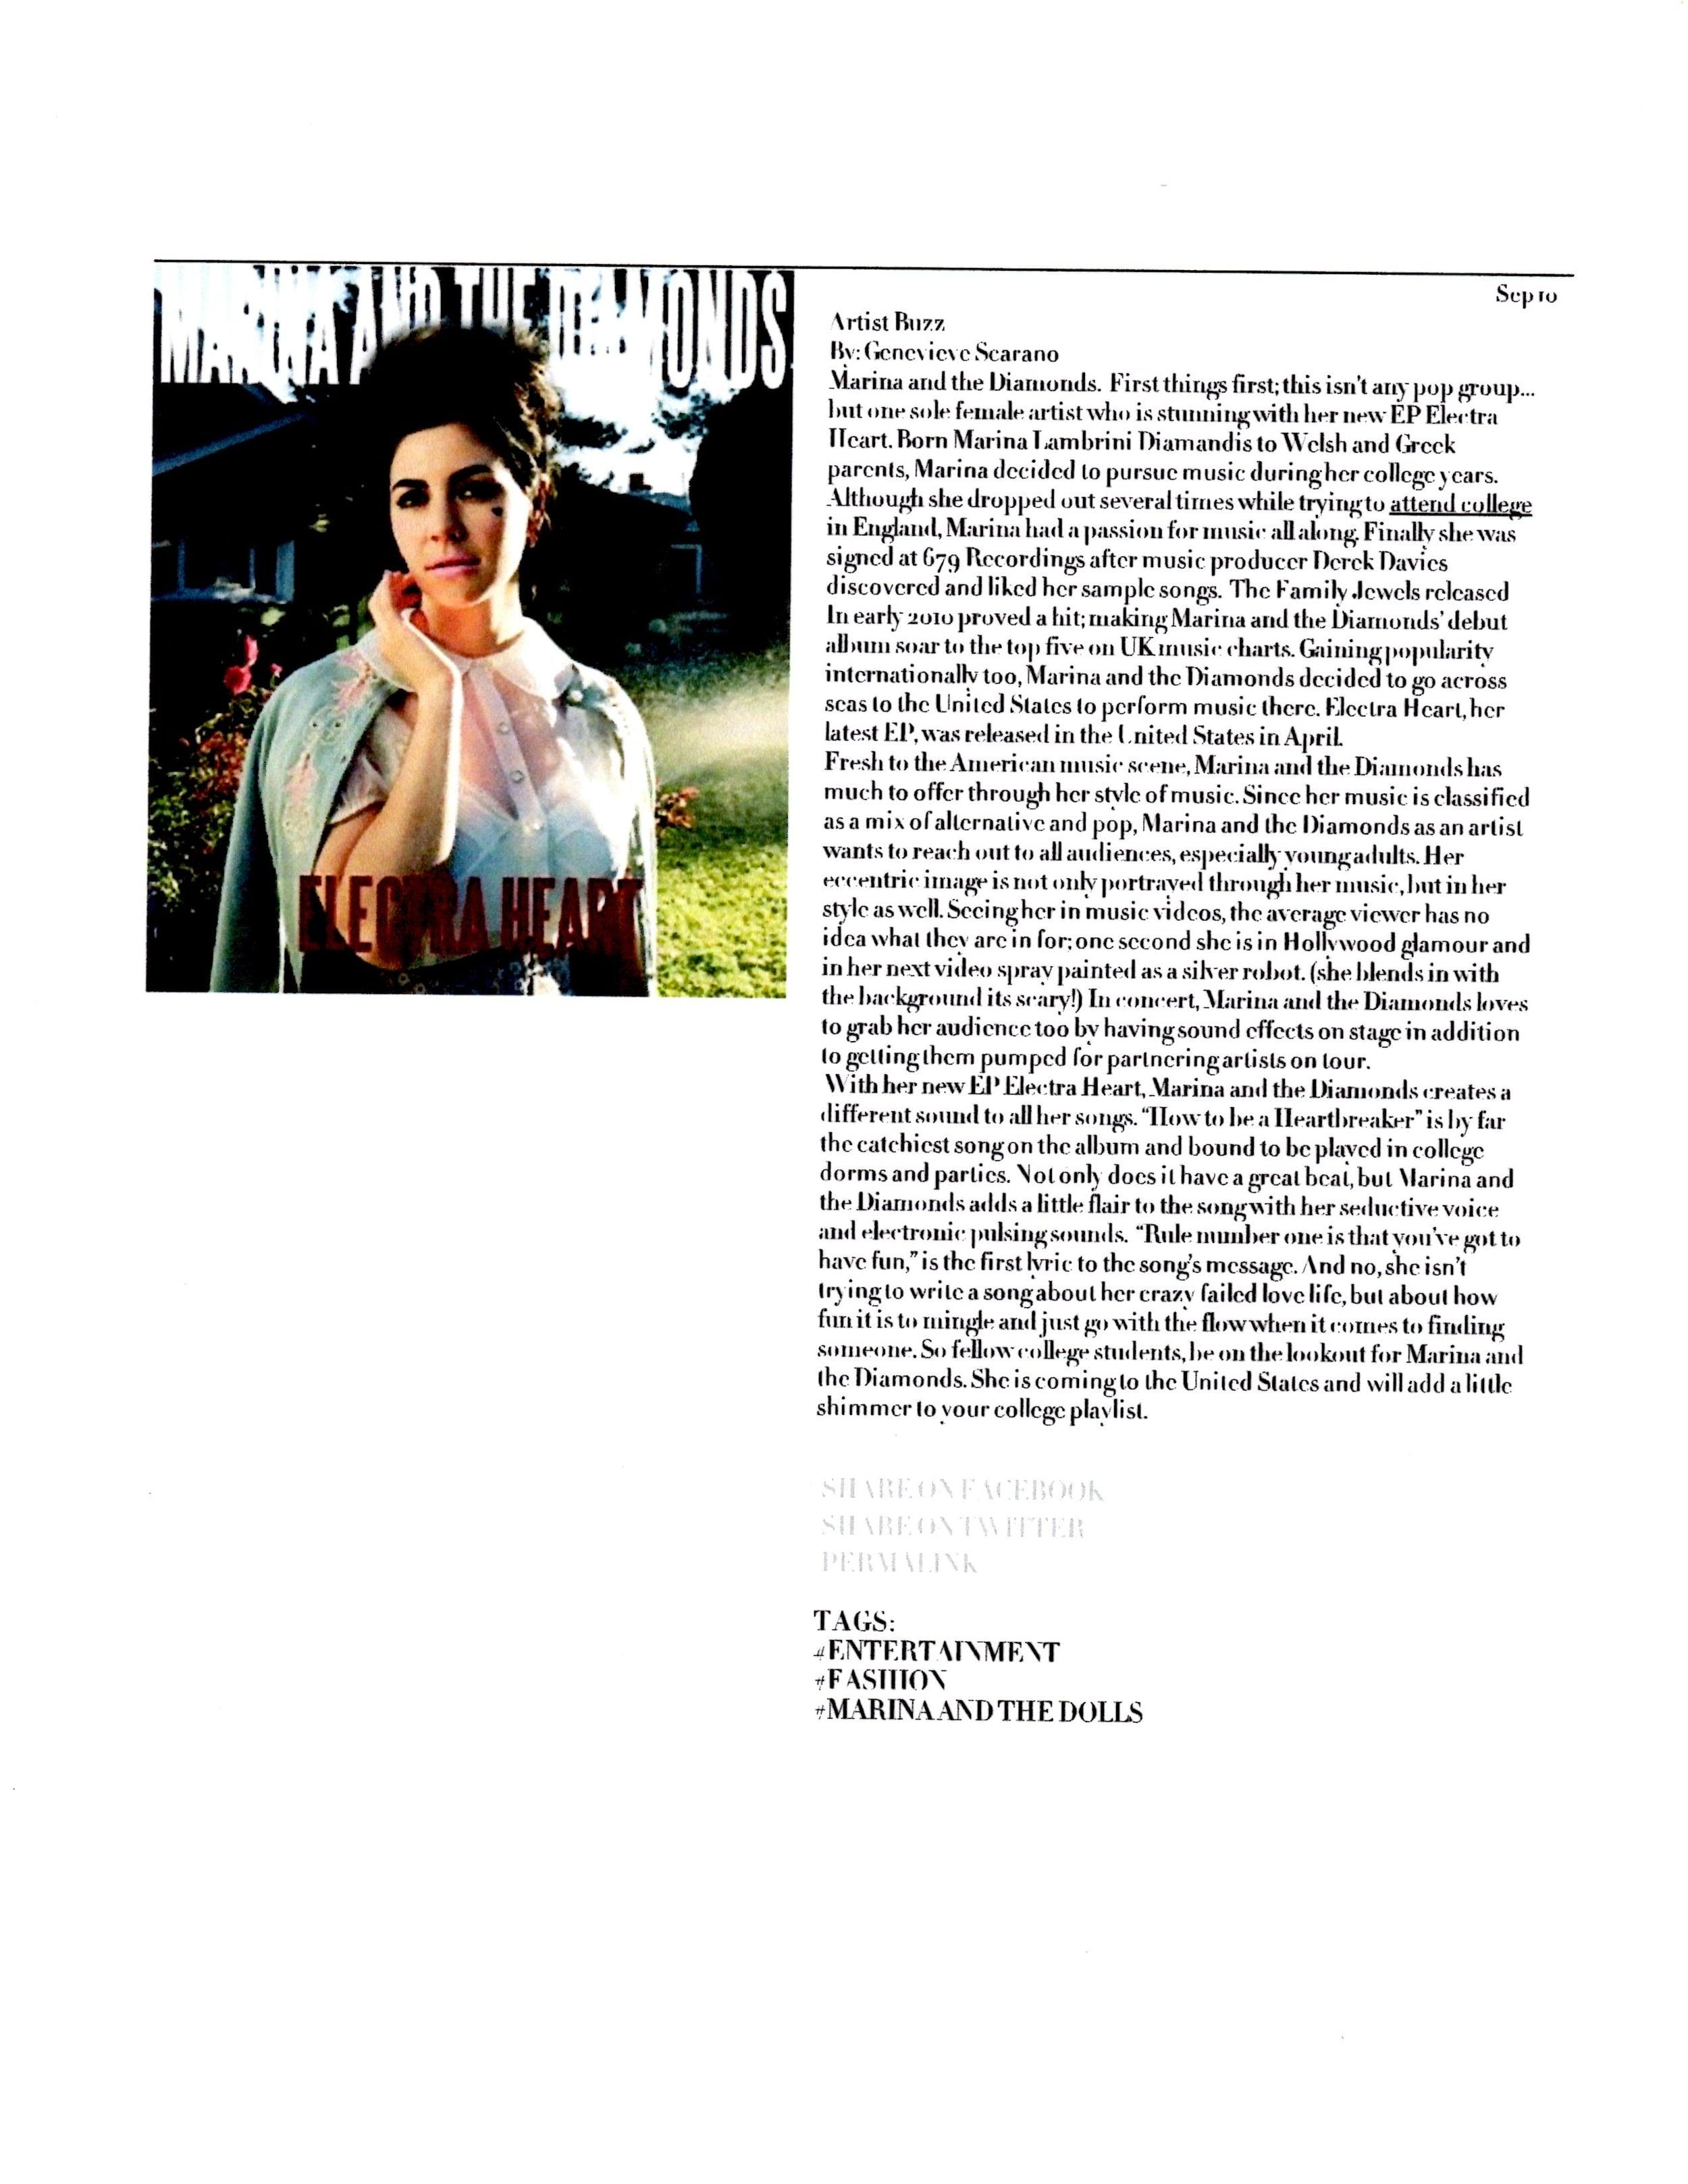 Marina and The Diamonds Feature